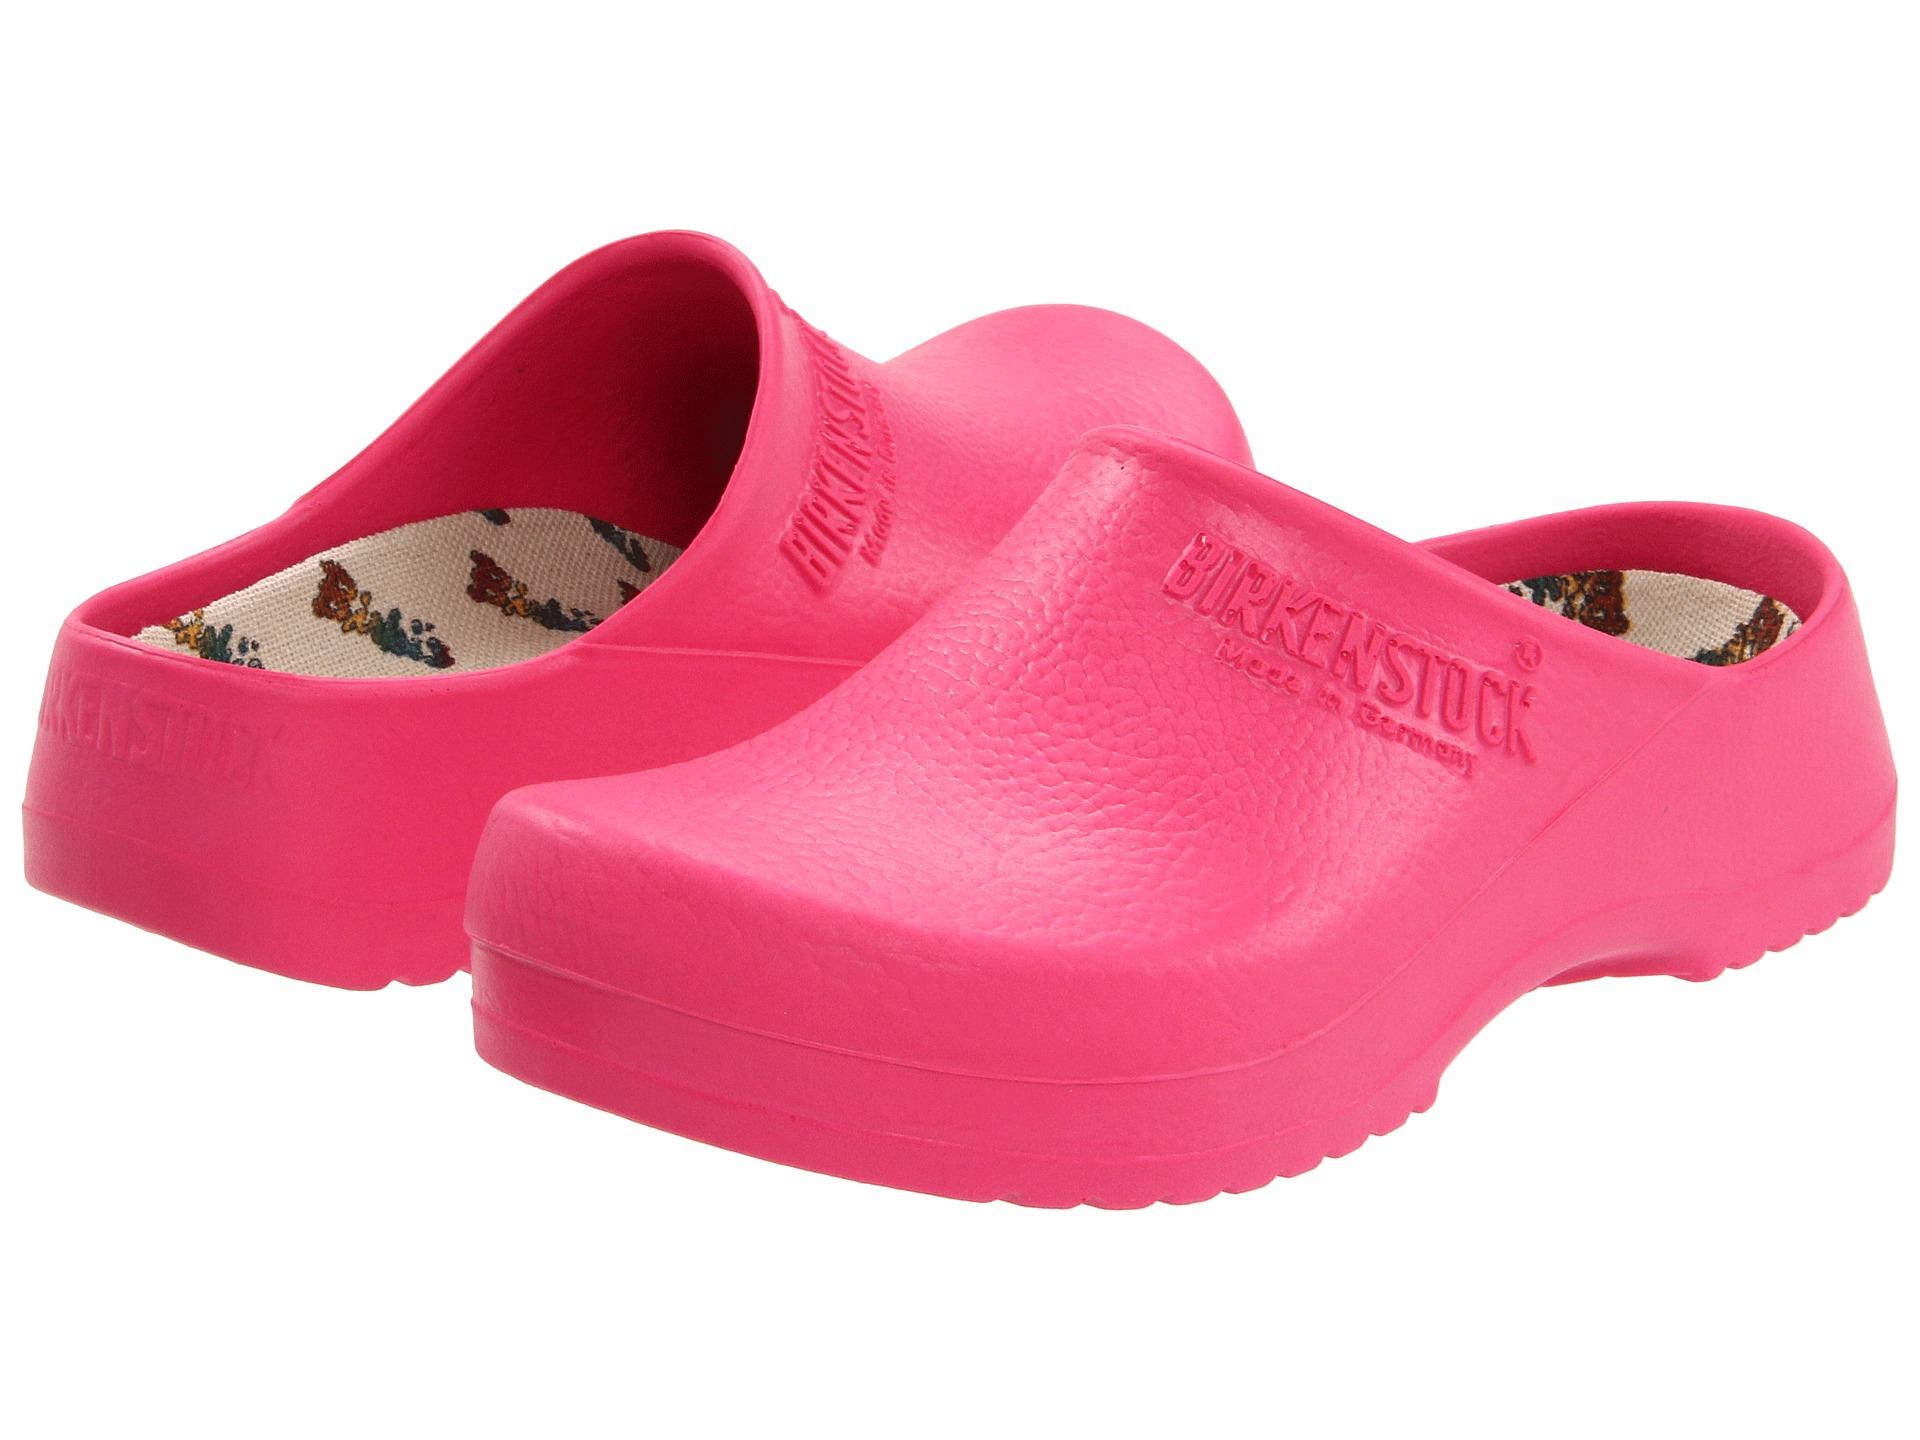 03fbe68b4ac775 Lyst - Birkenstock Super Birki By in Pink